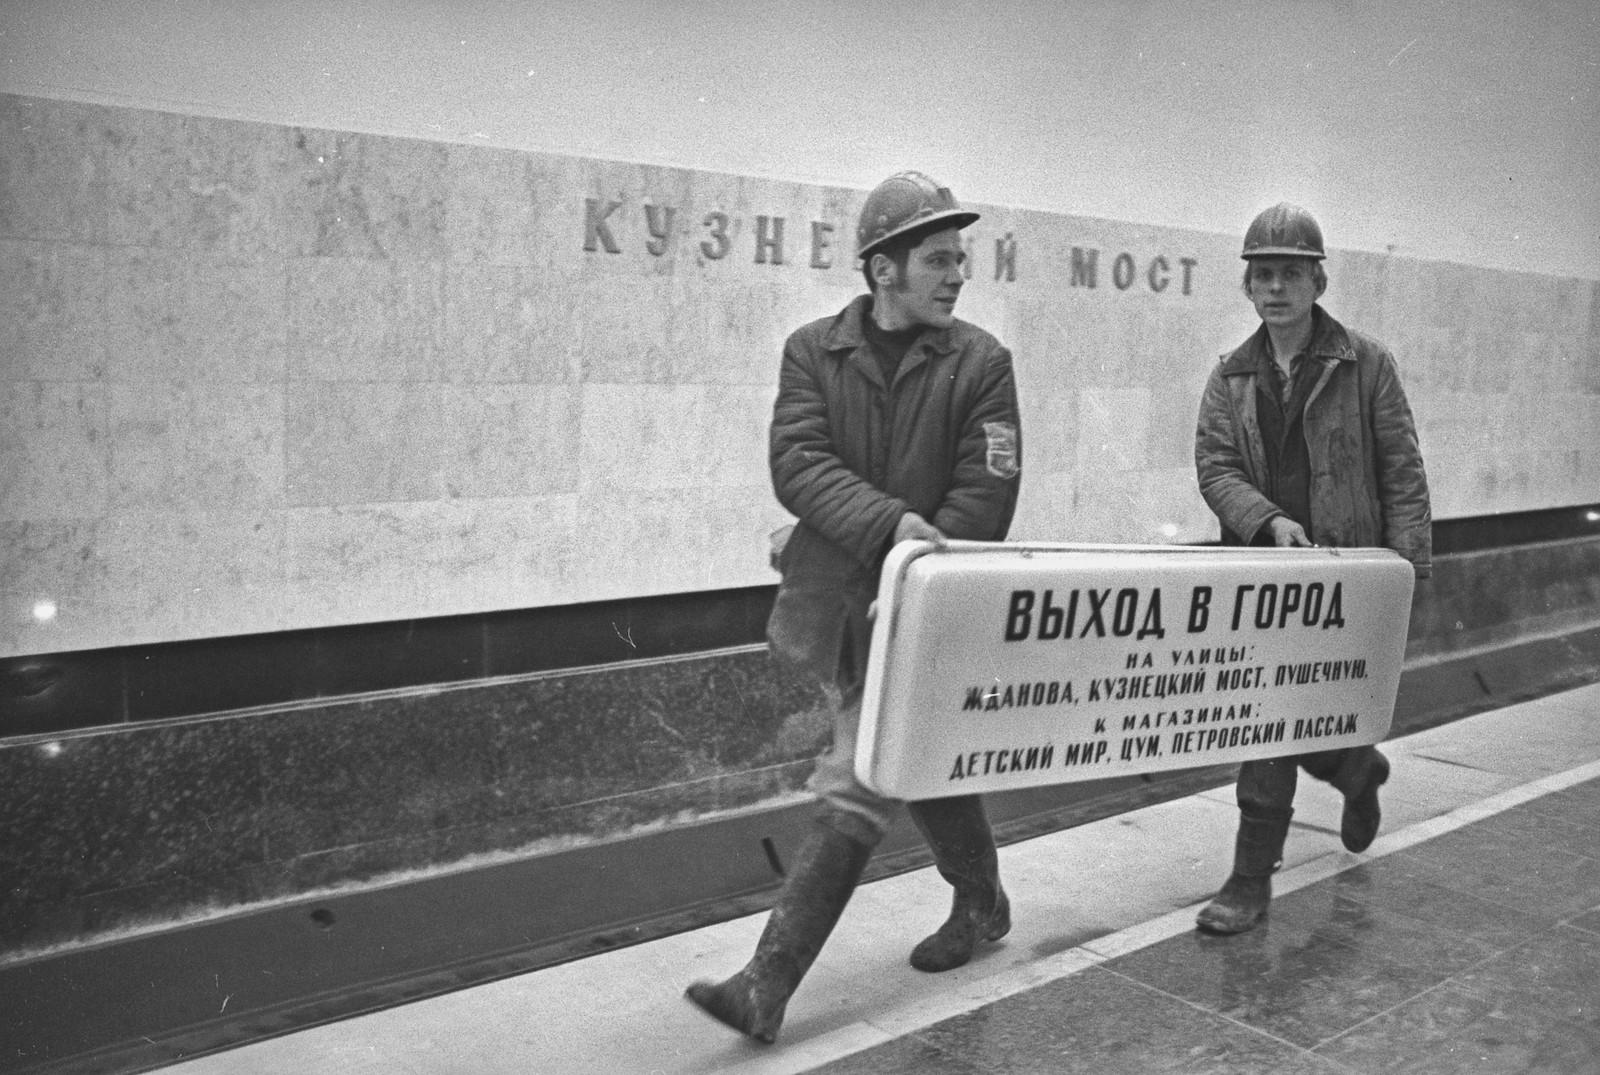 1975. Строители несут табличку «Выход в город» на станции метро «Кузнецкий мост»